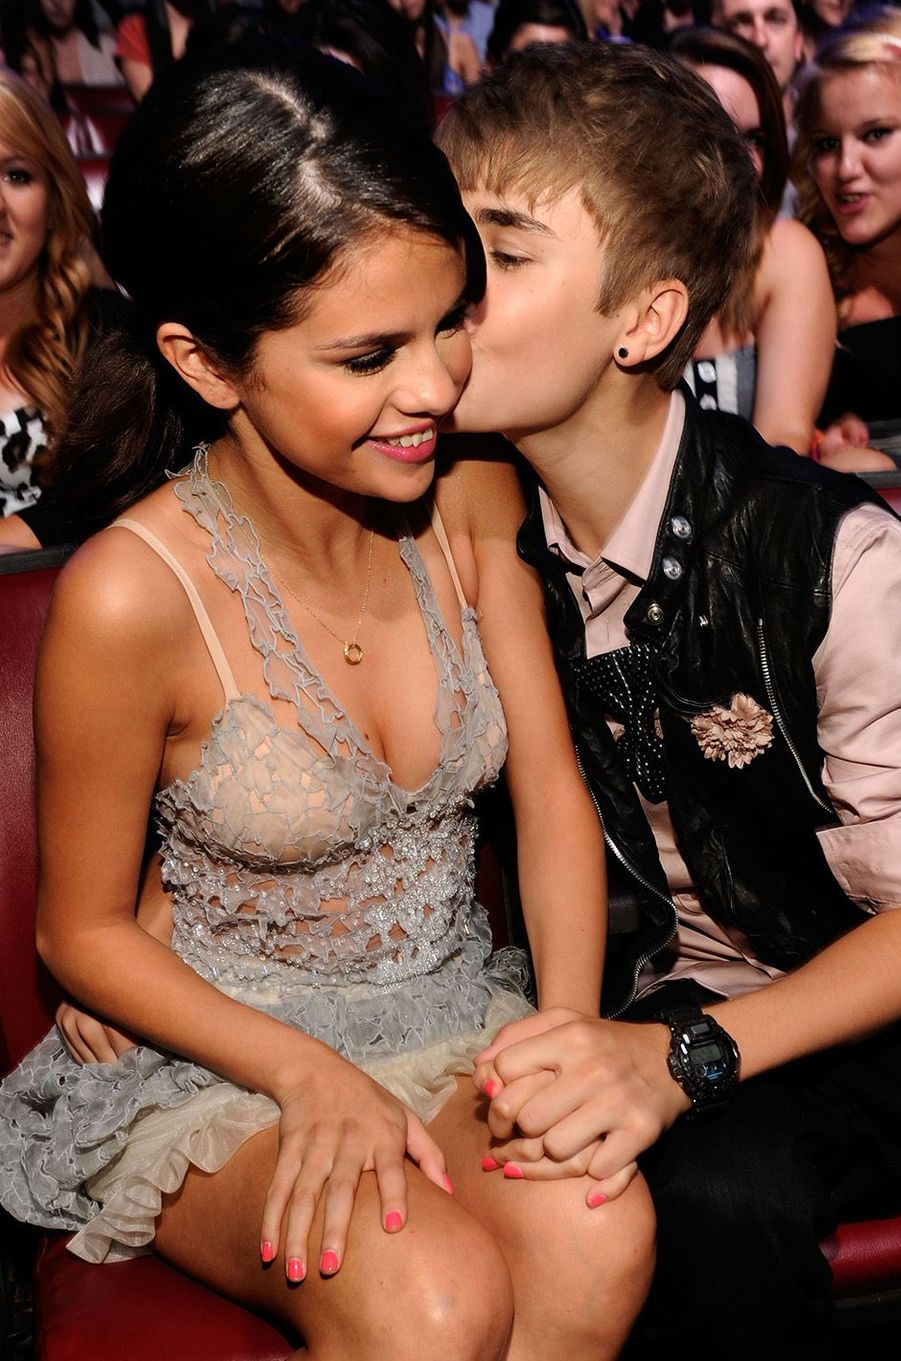 Justin Bieber et Selena Gomez aux Teen Choice Awards en 2011.